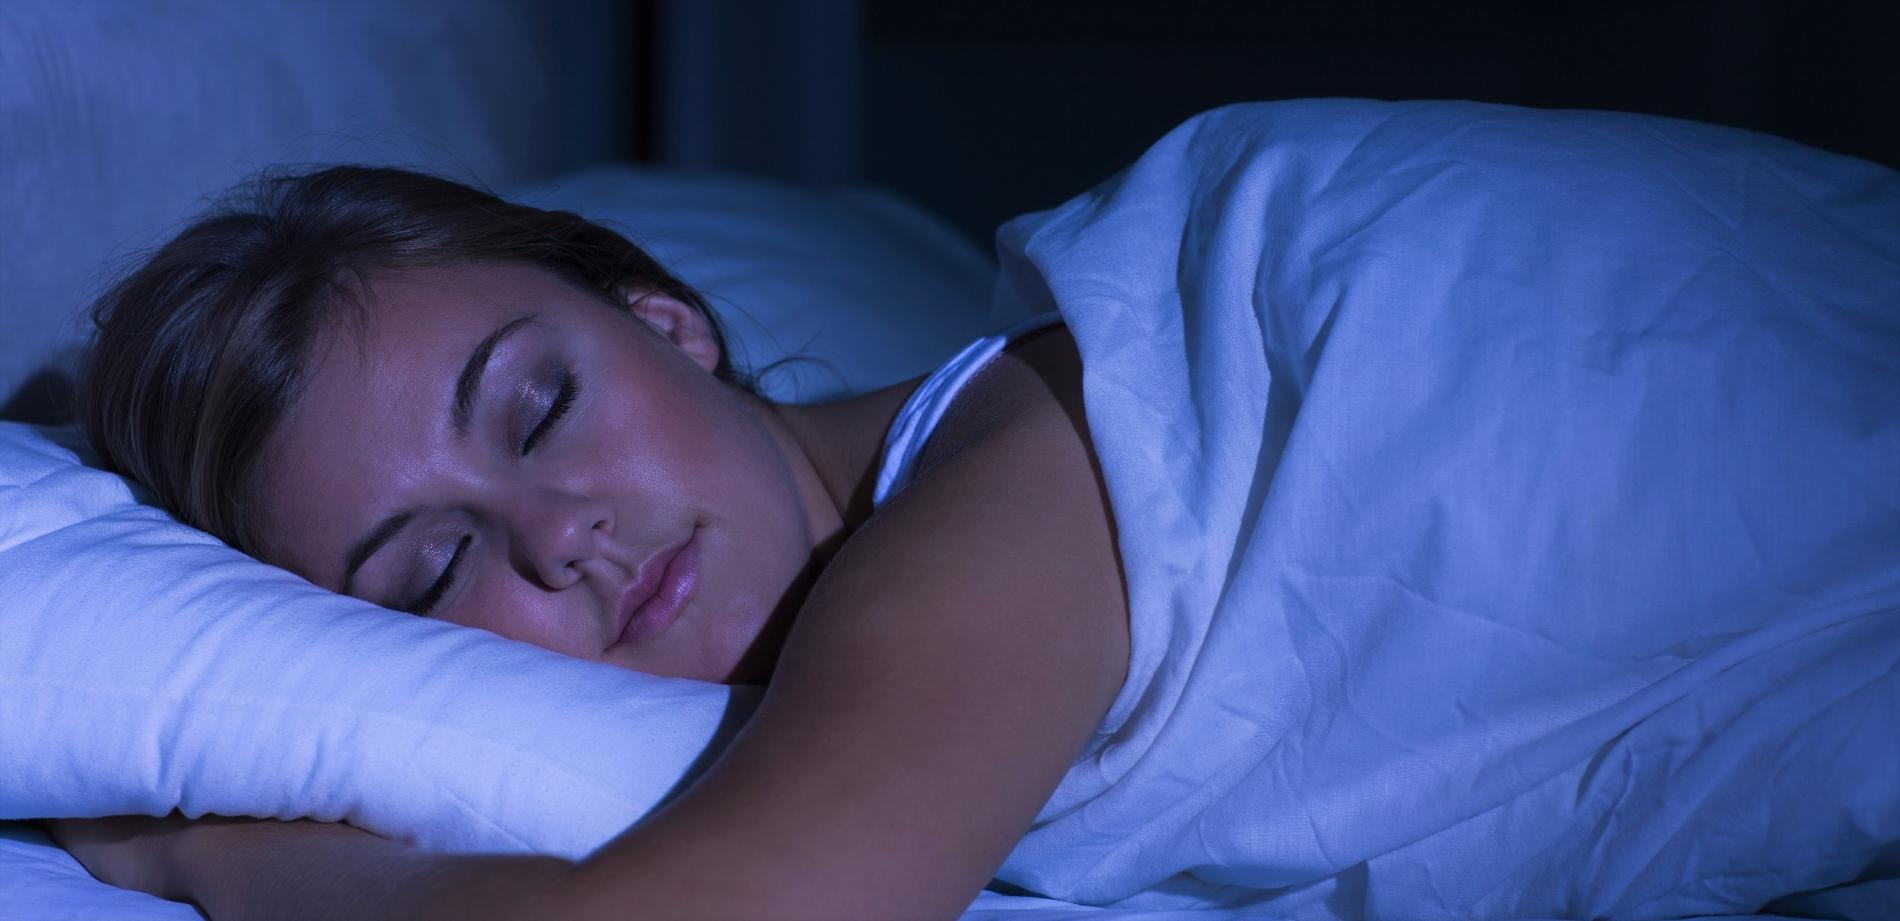 Frau lernt Sprachen im Schlaf